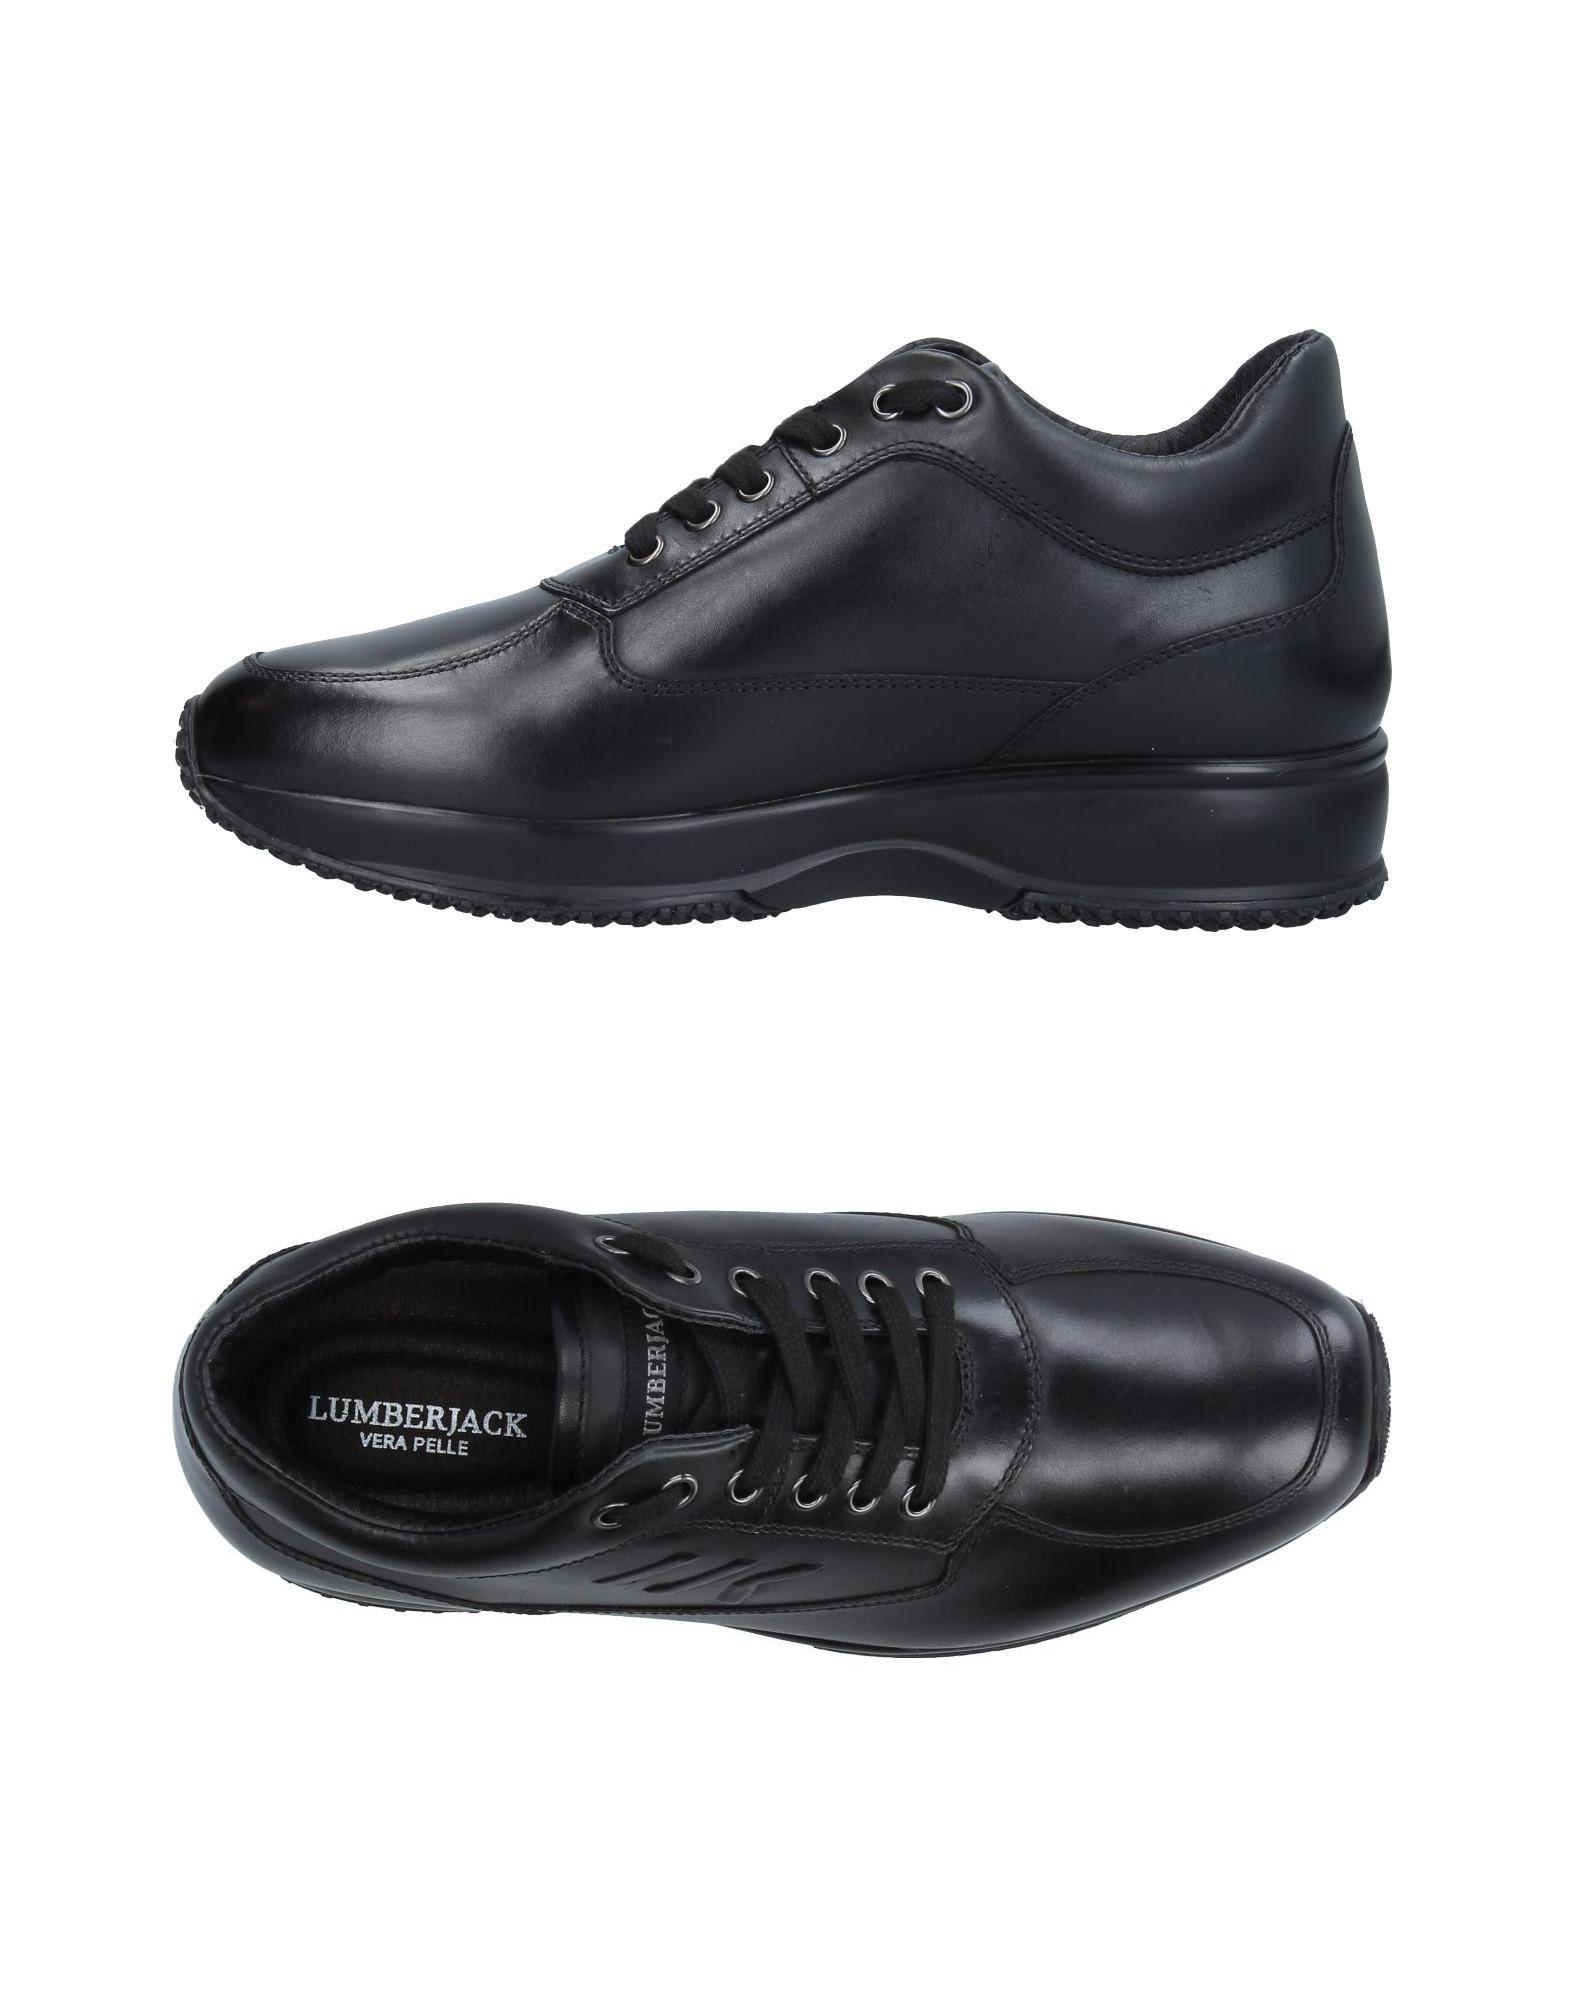 A buon mercato Sneakers Lumberjack Uomo - 11321153HN